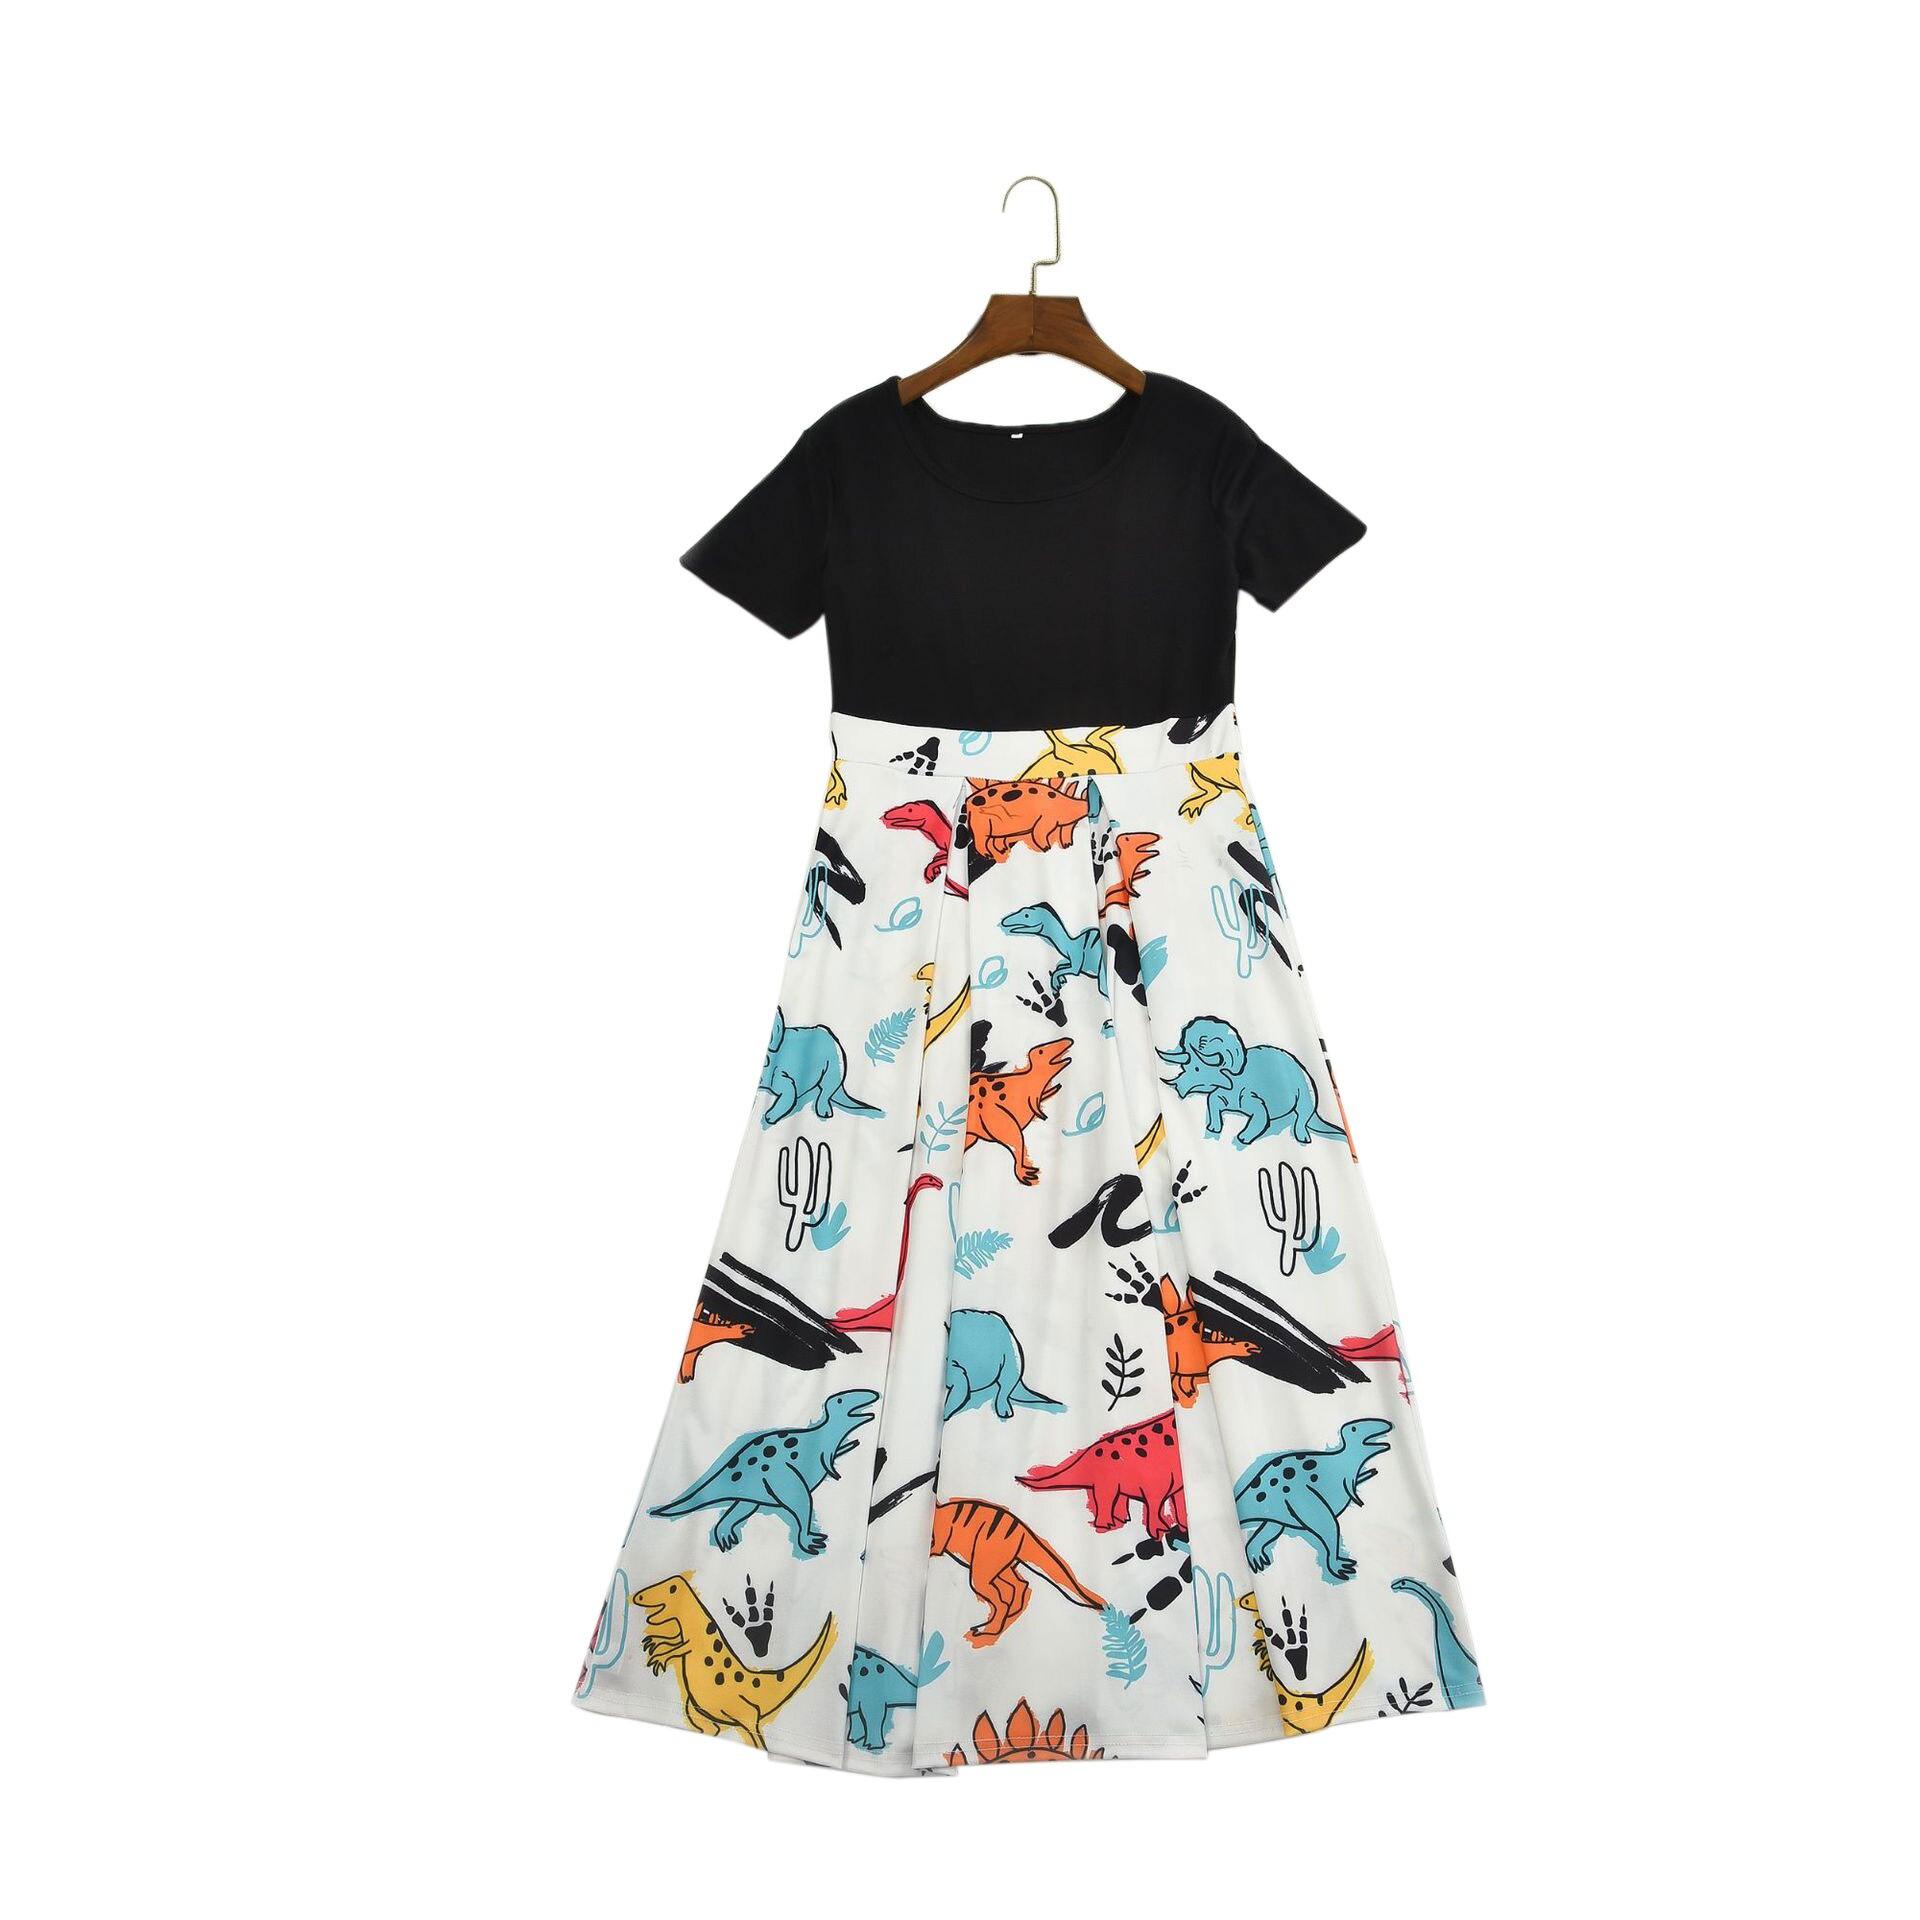 Top SaleDress Outfits-Set Matching Parent-Child Daughter Boho Midi Midi